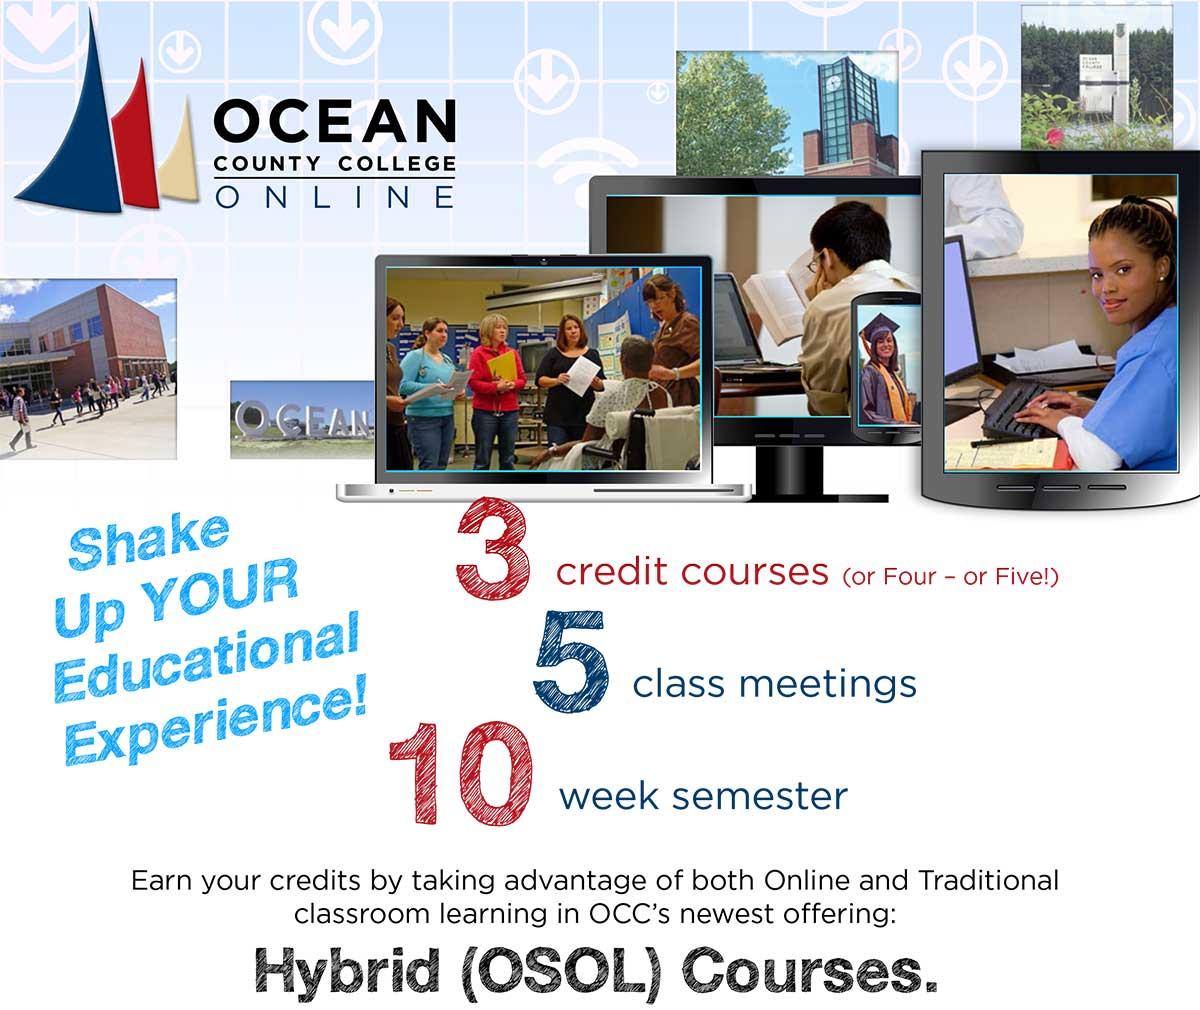 College Online Classes: Ocean County College Online Classes